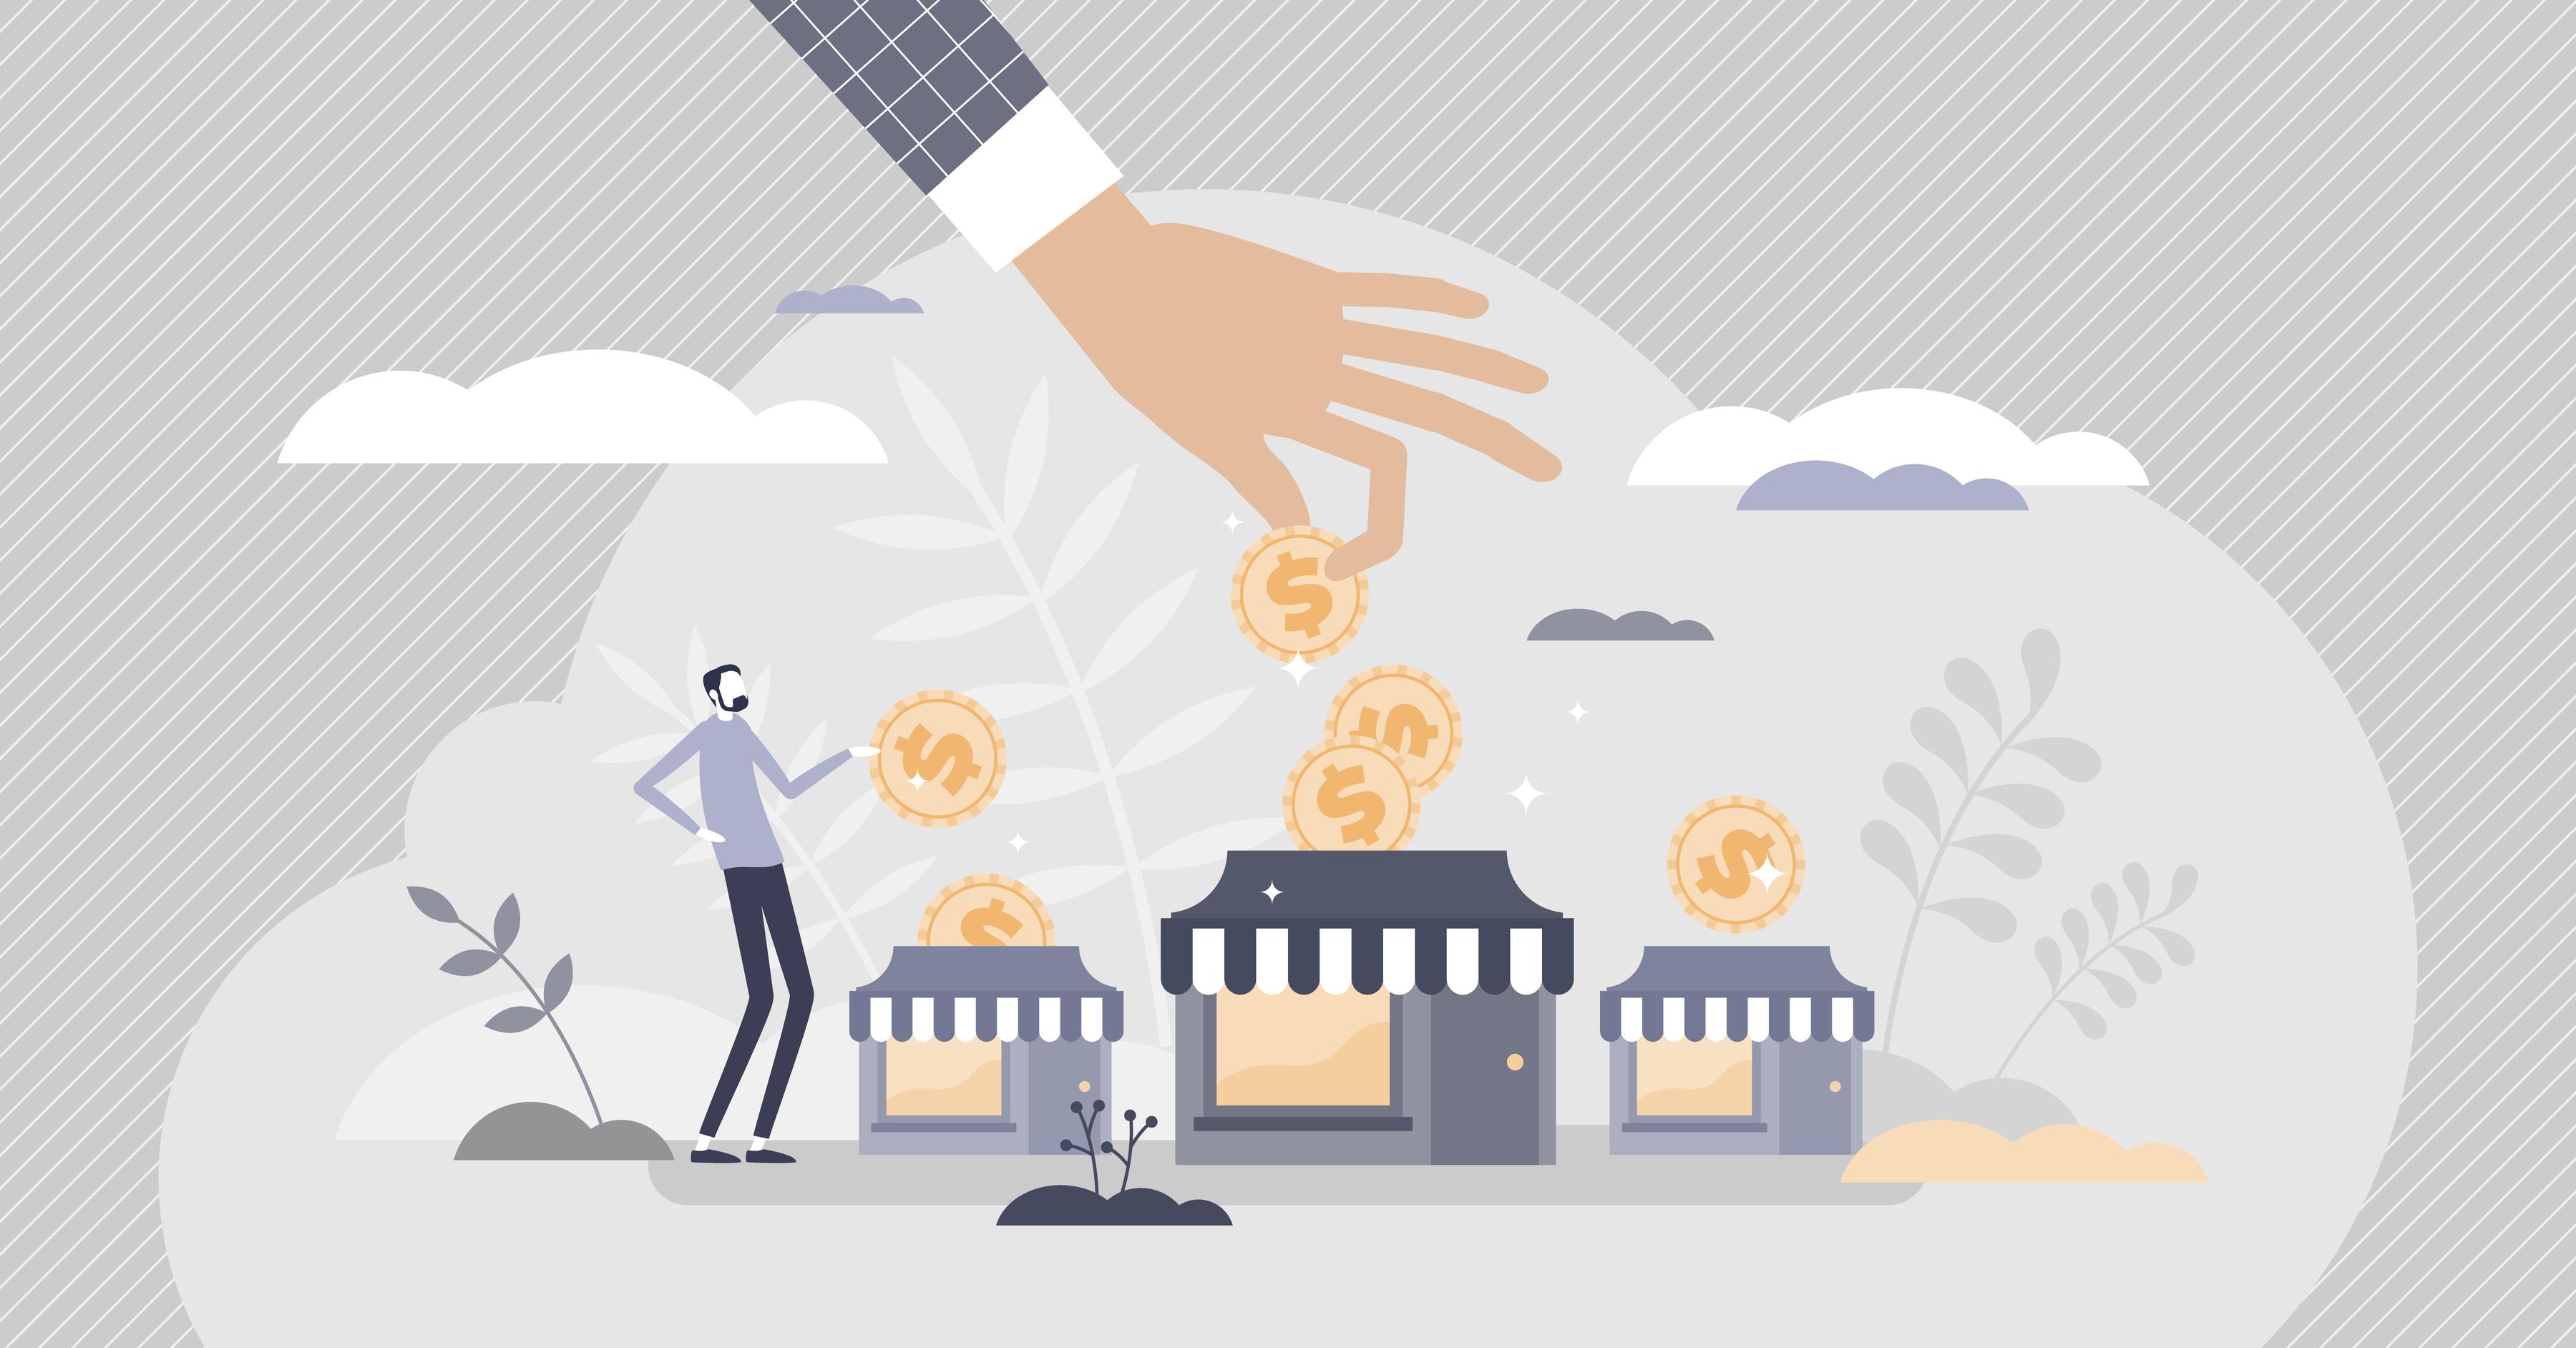 Illustration conveying budgeting